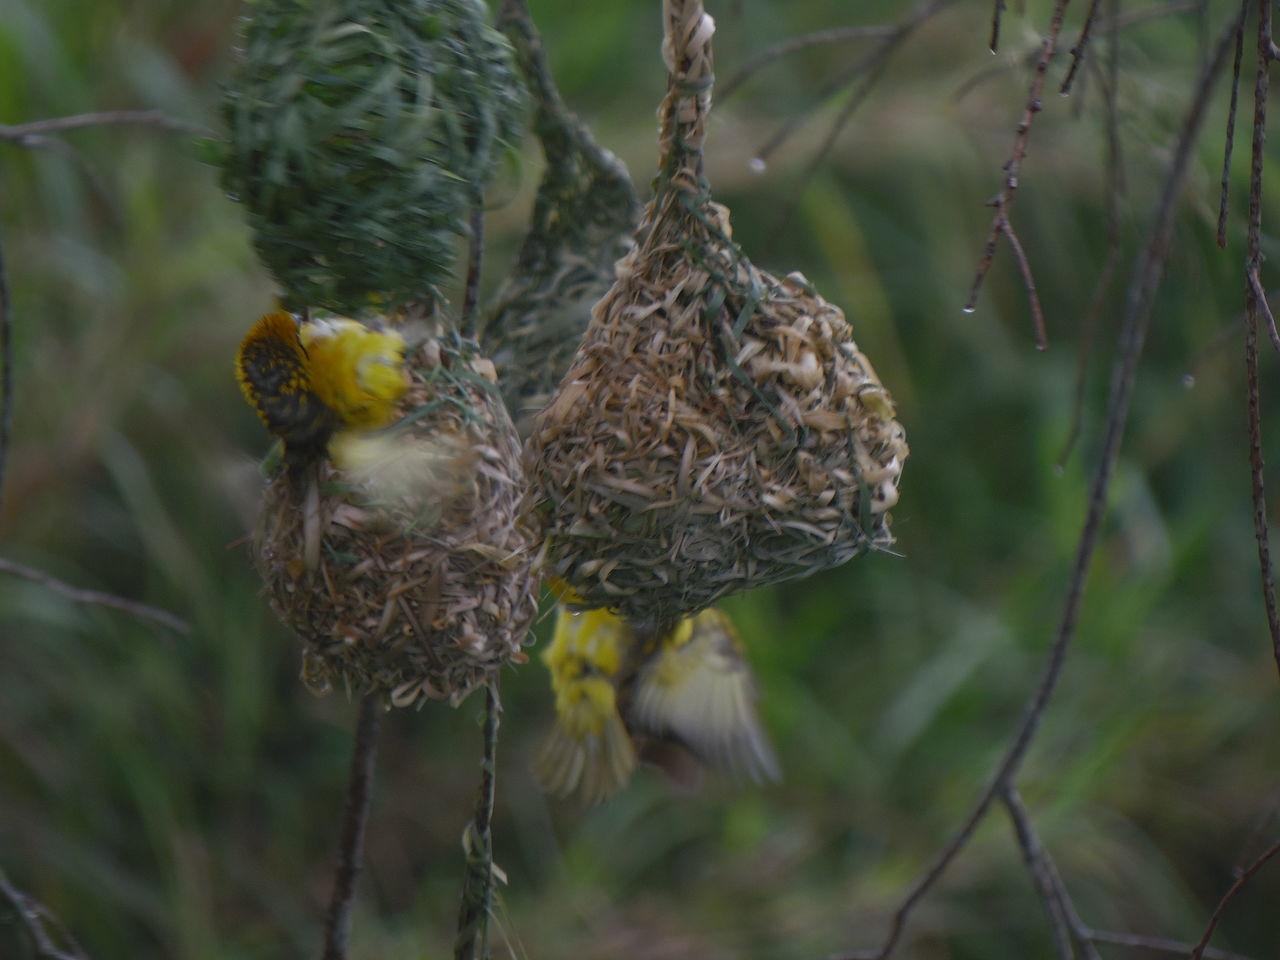 Caught In The Act Hanging Around Enjoying Life Birds Birds Wildlife